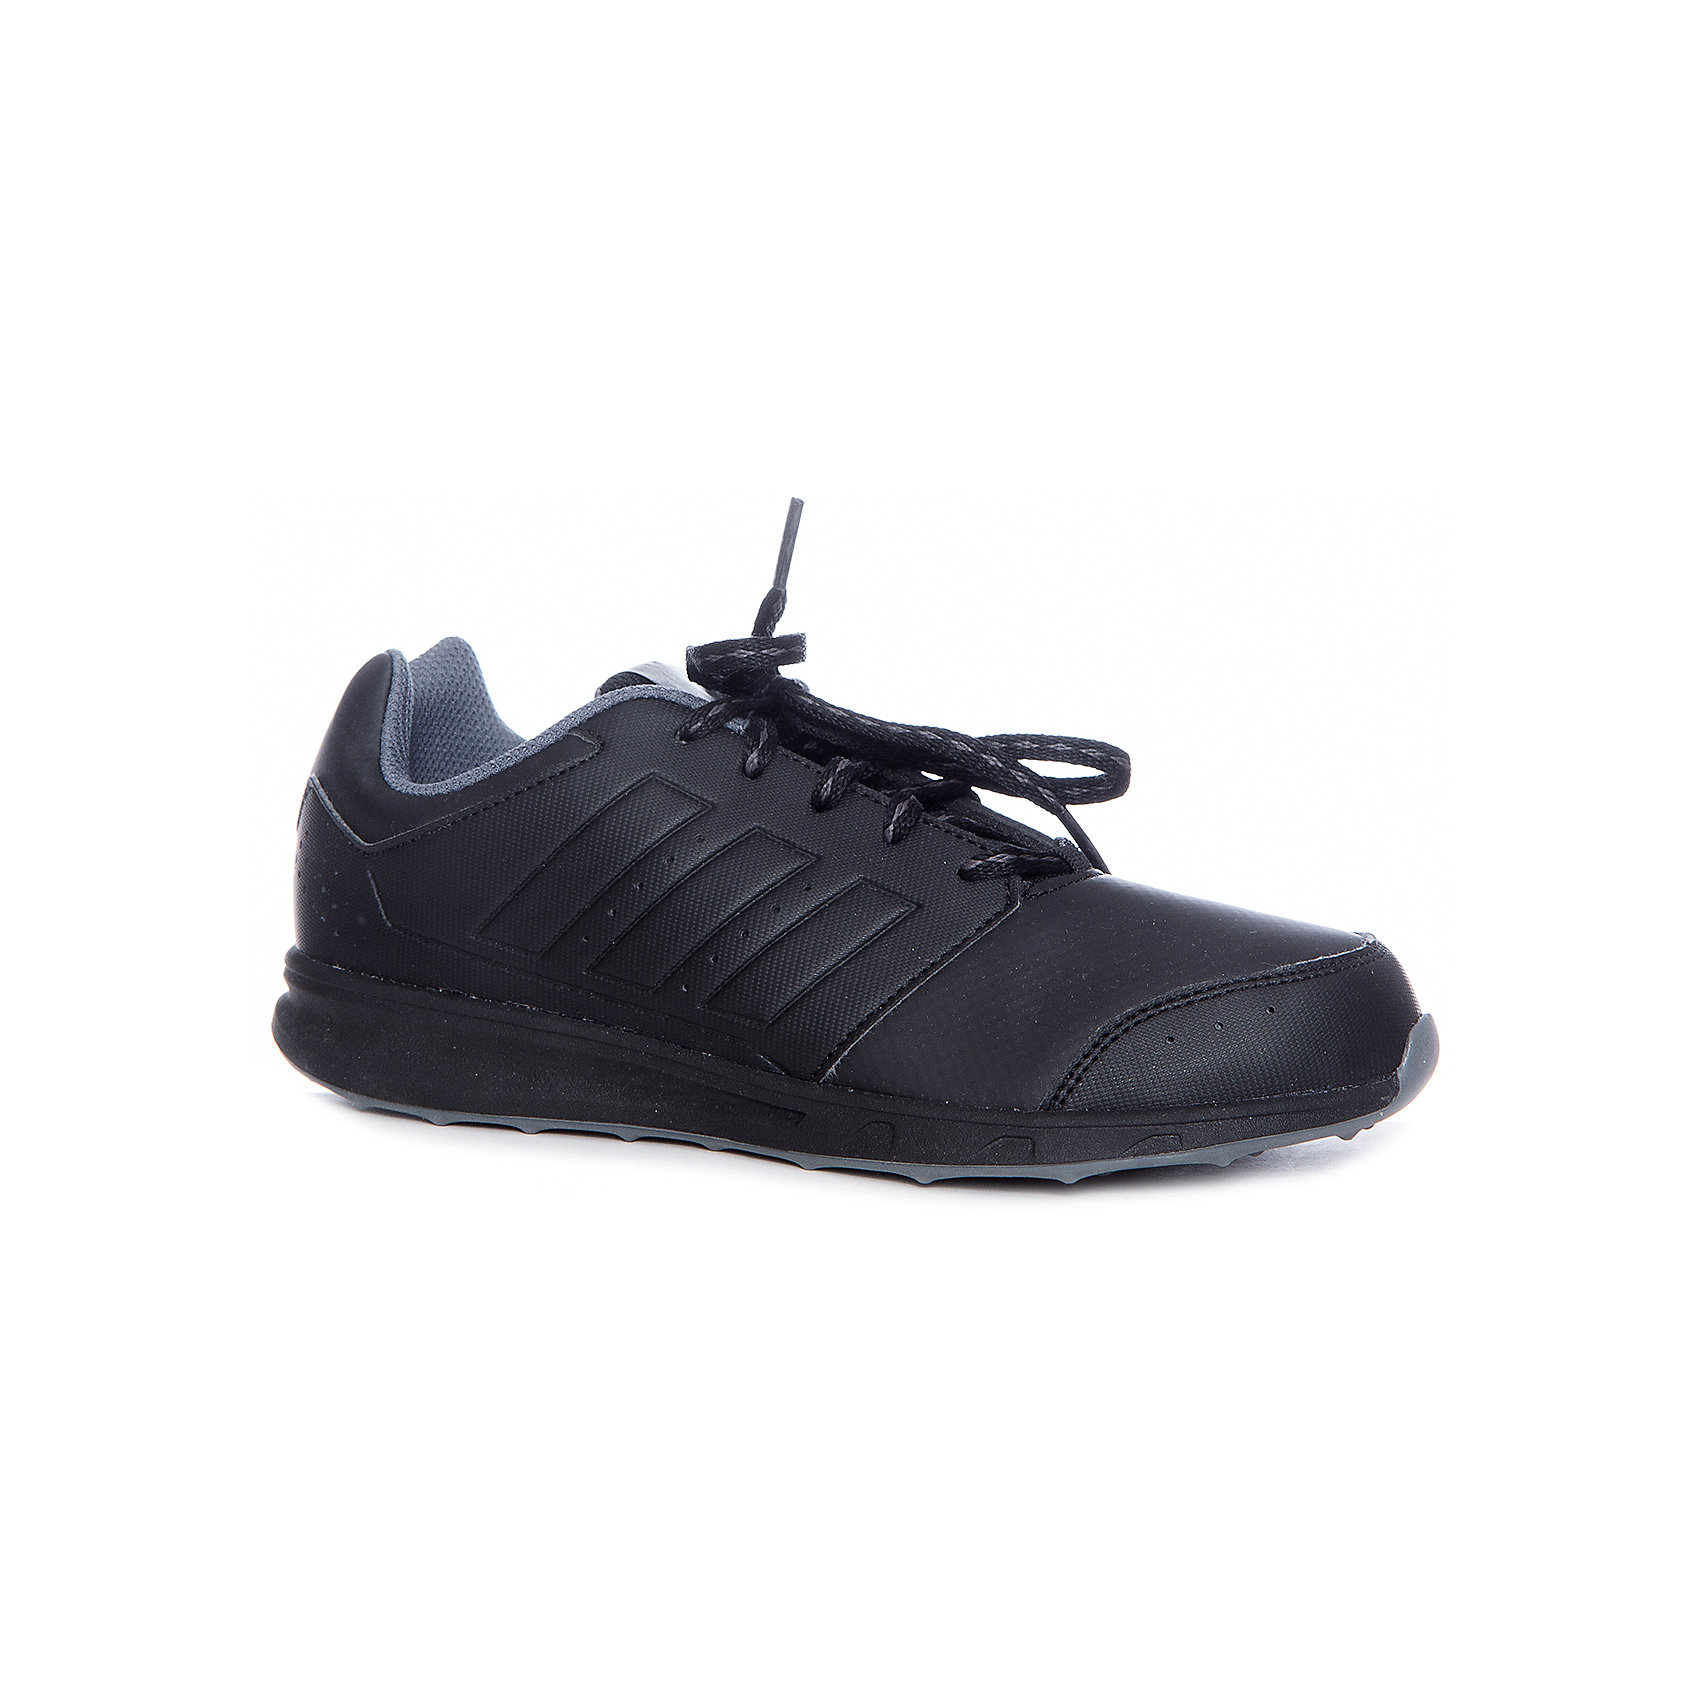 adidas Кроссовки Perfromance Lk Sport 2 K adidas кроссовки adidas кроссовки дет спорт durama k cblack ftwwht sunglo